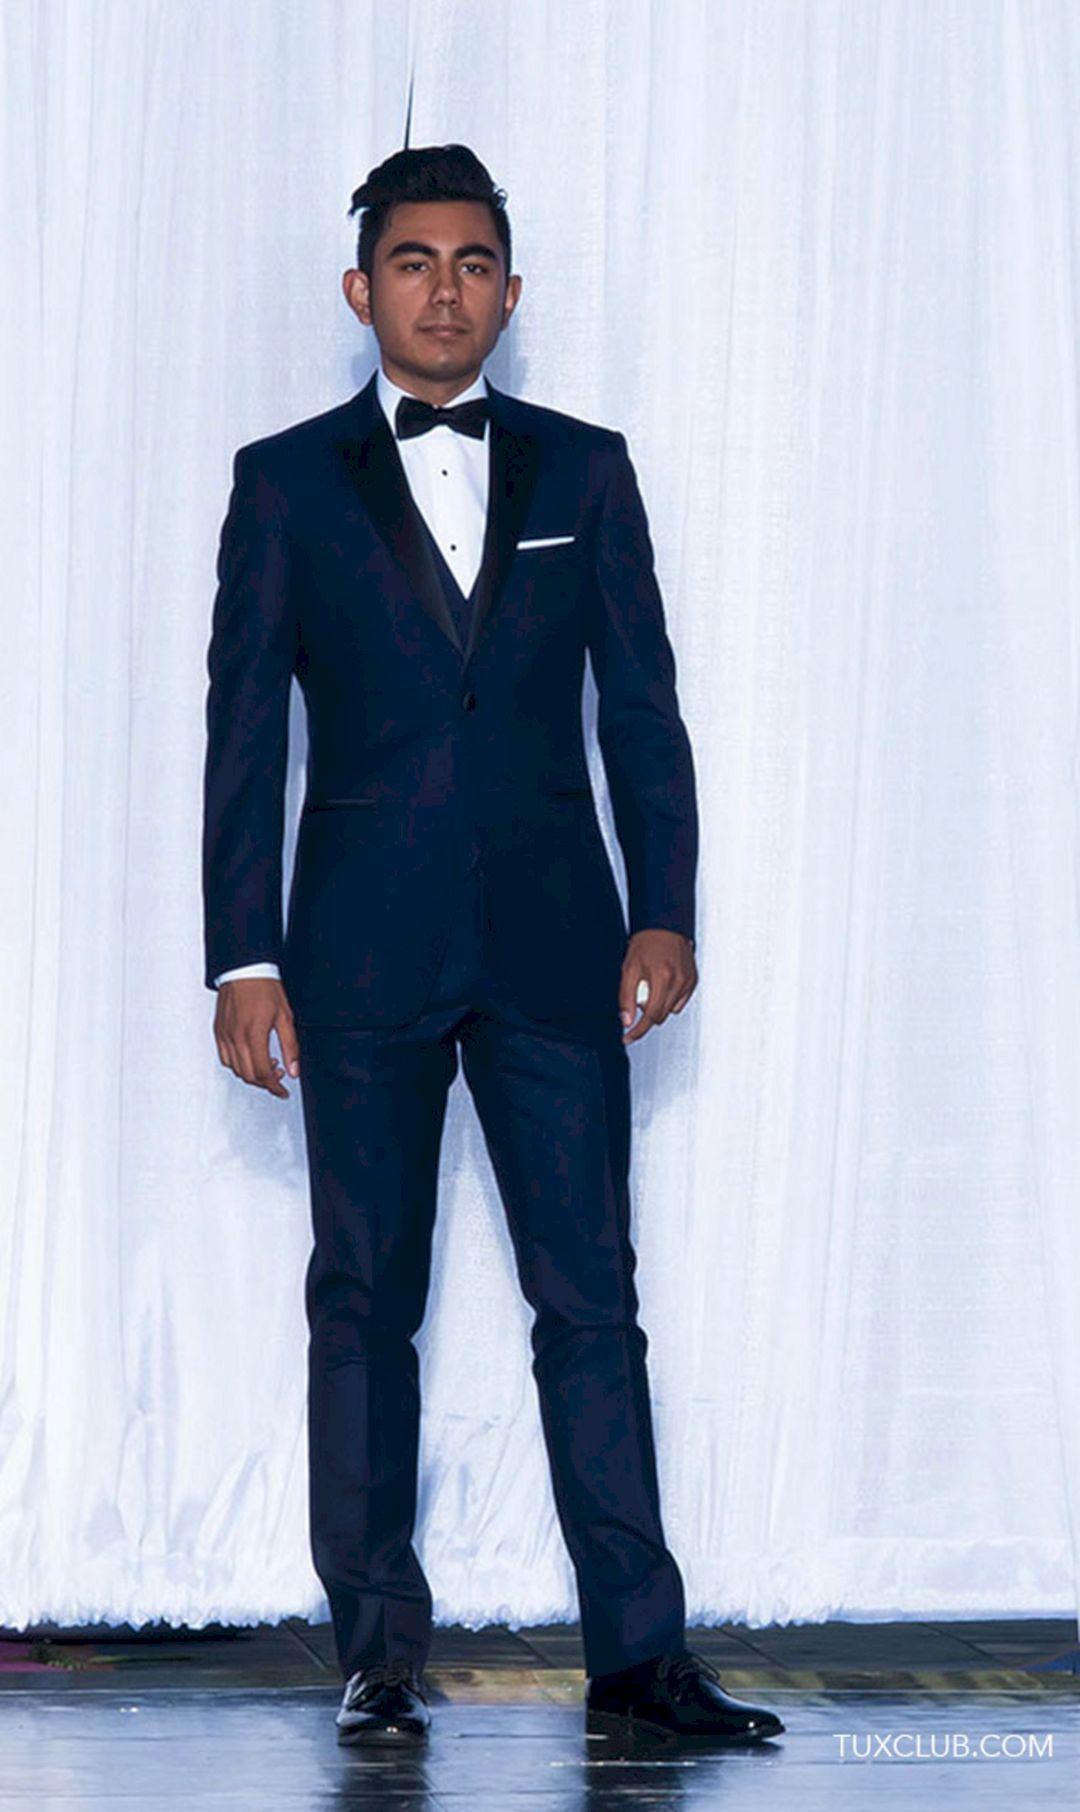 best wedding dress wear a blue tuxedo ideas blue tuxedos and